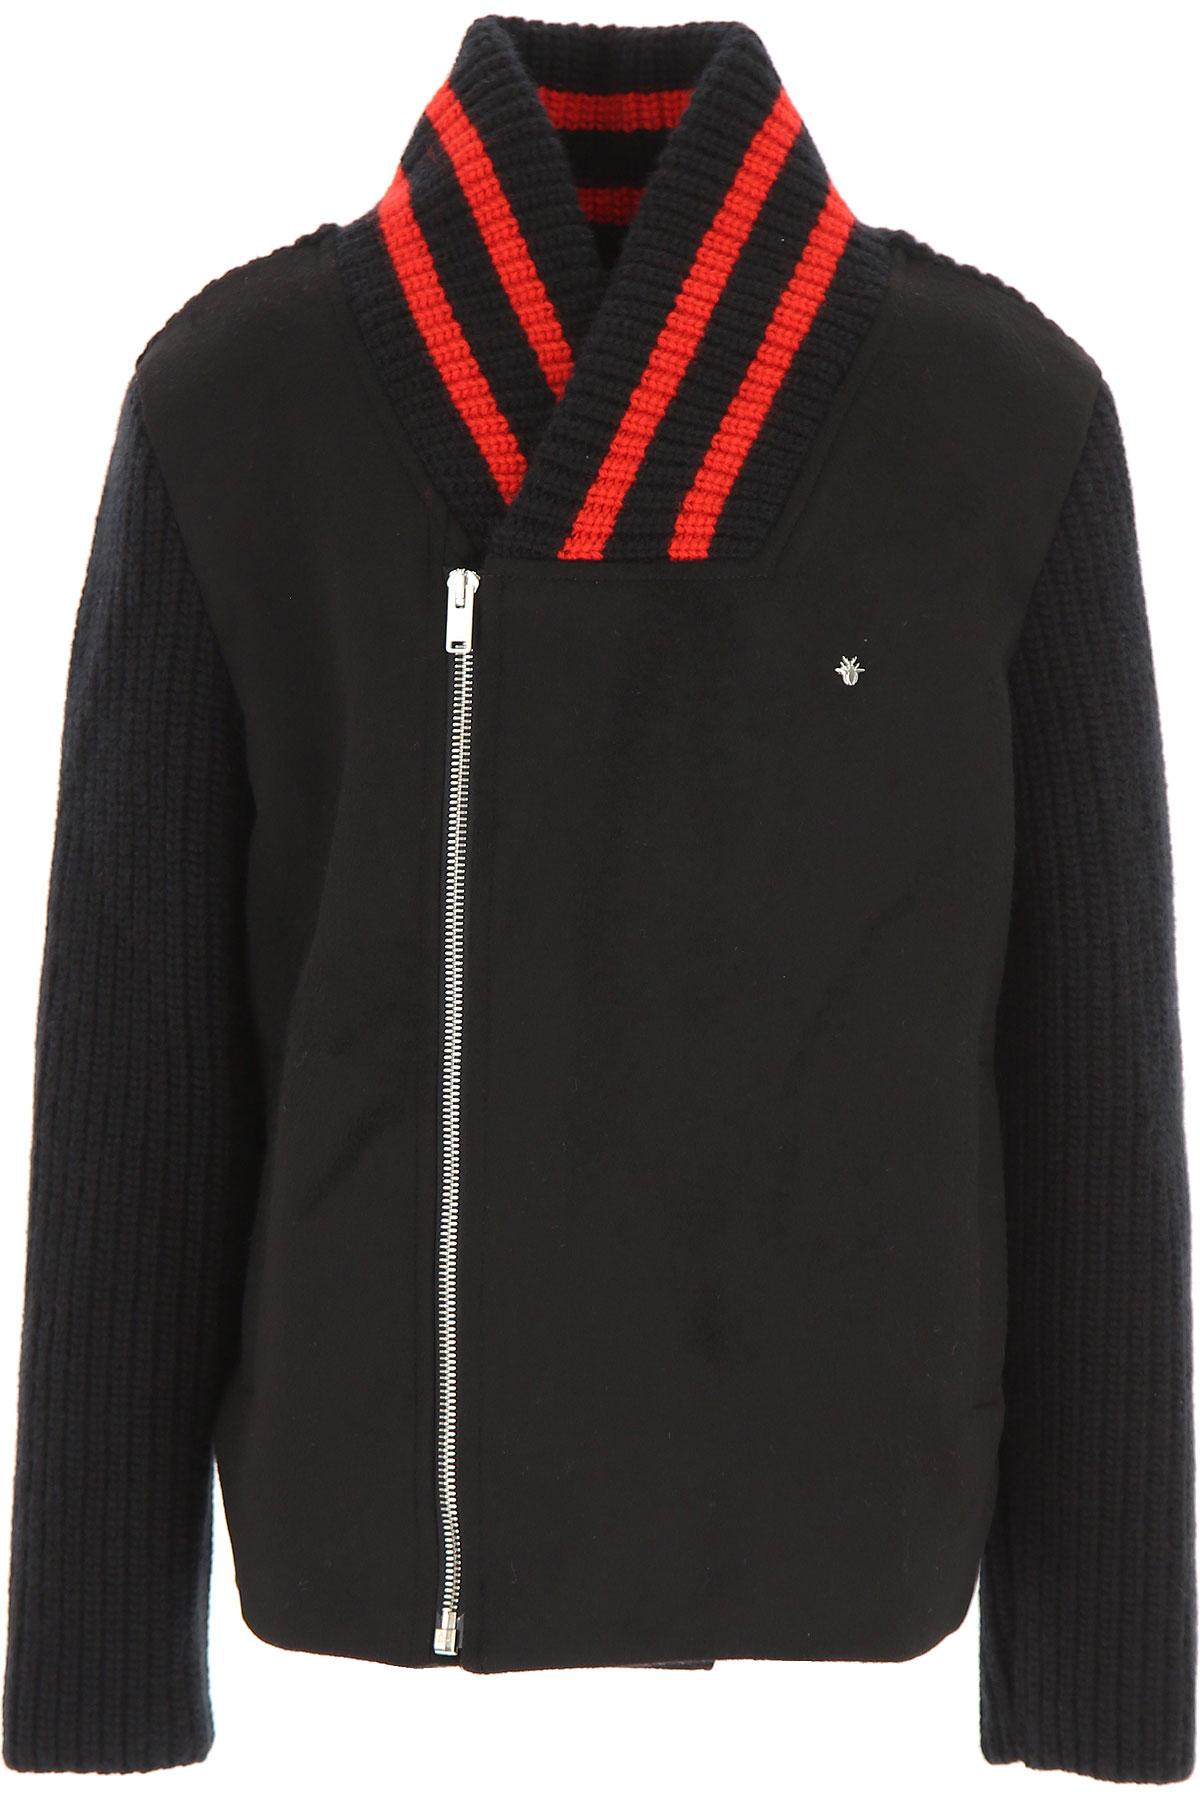 Image of Christian Dior Kids Jacket for Boys, Black, Wool, 2017, 10Y 14Y 8Y